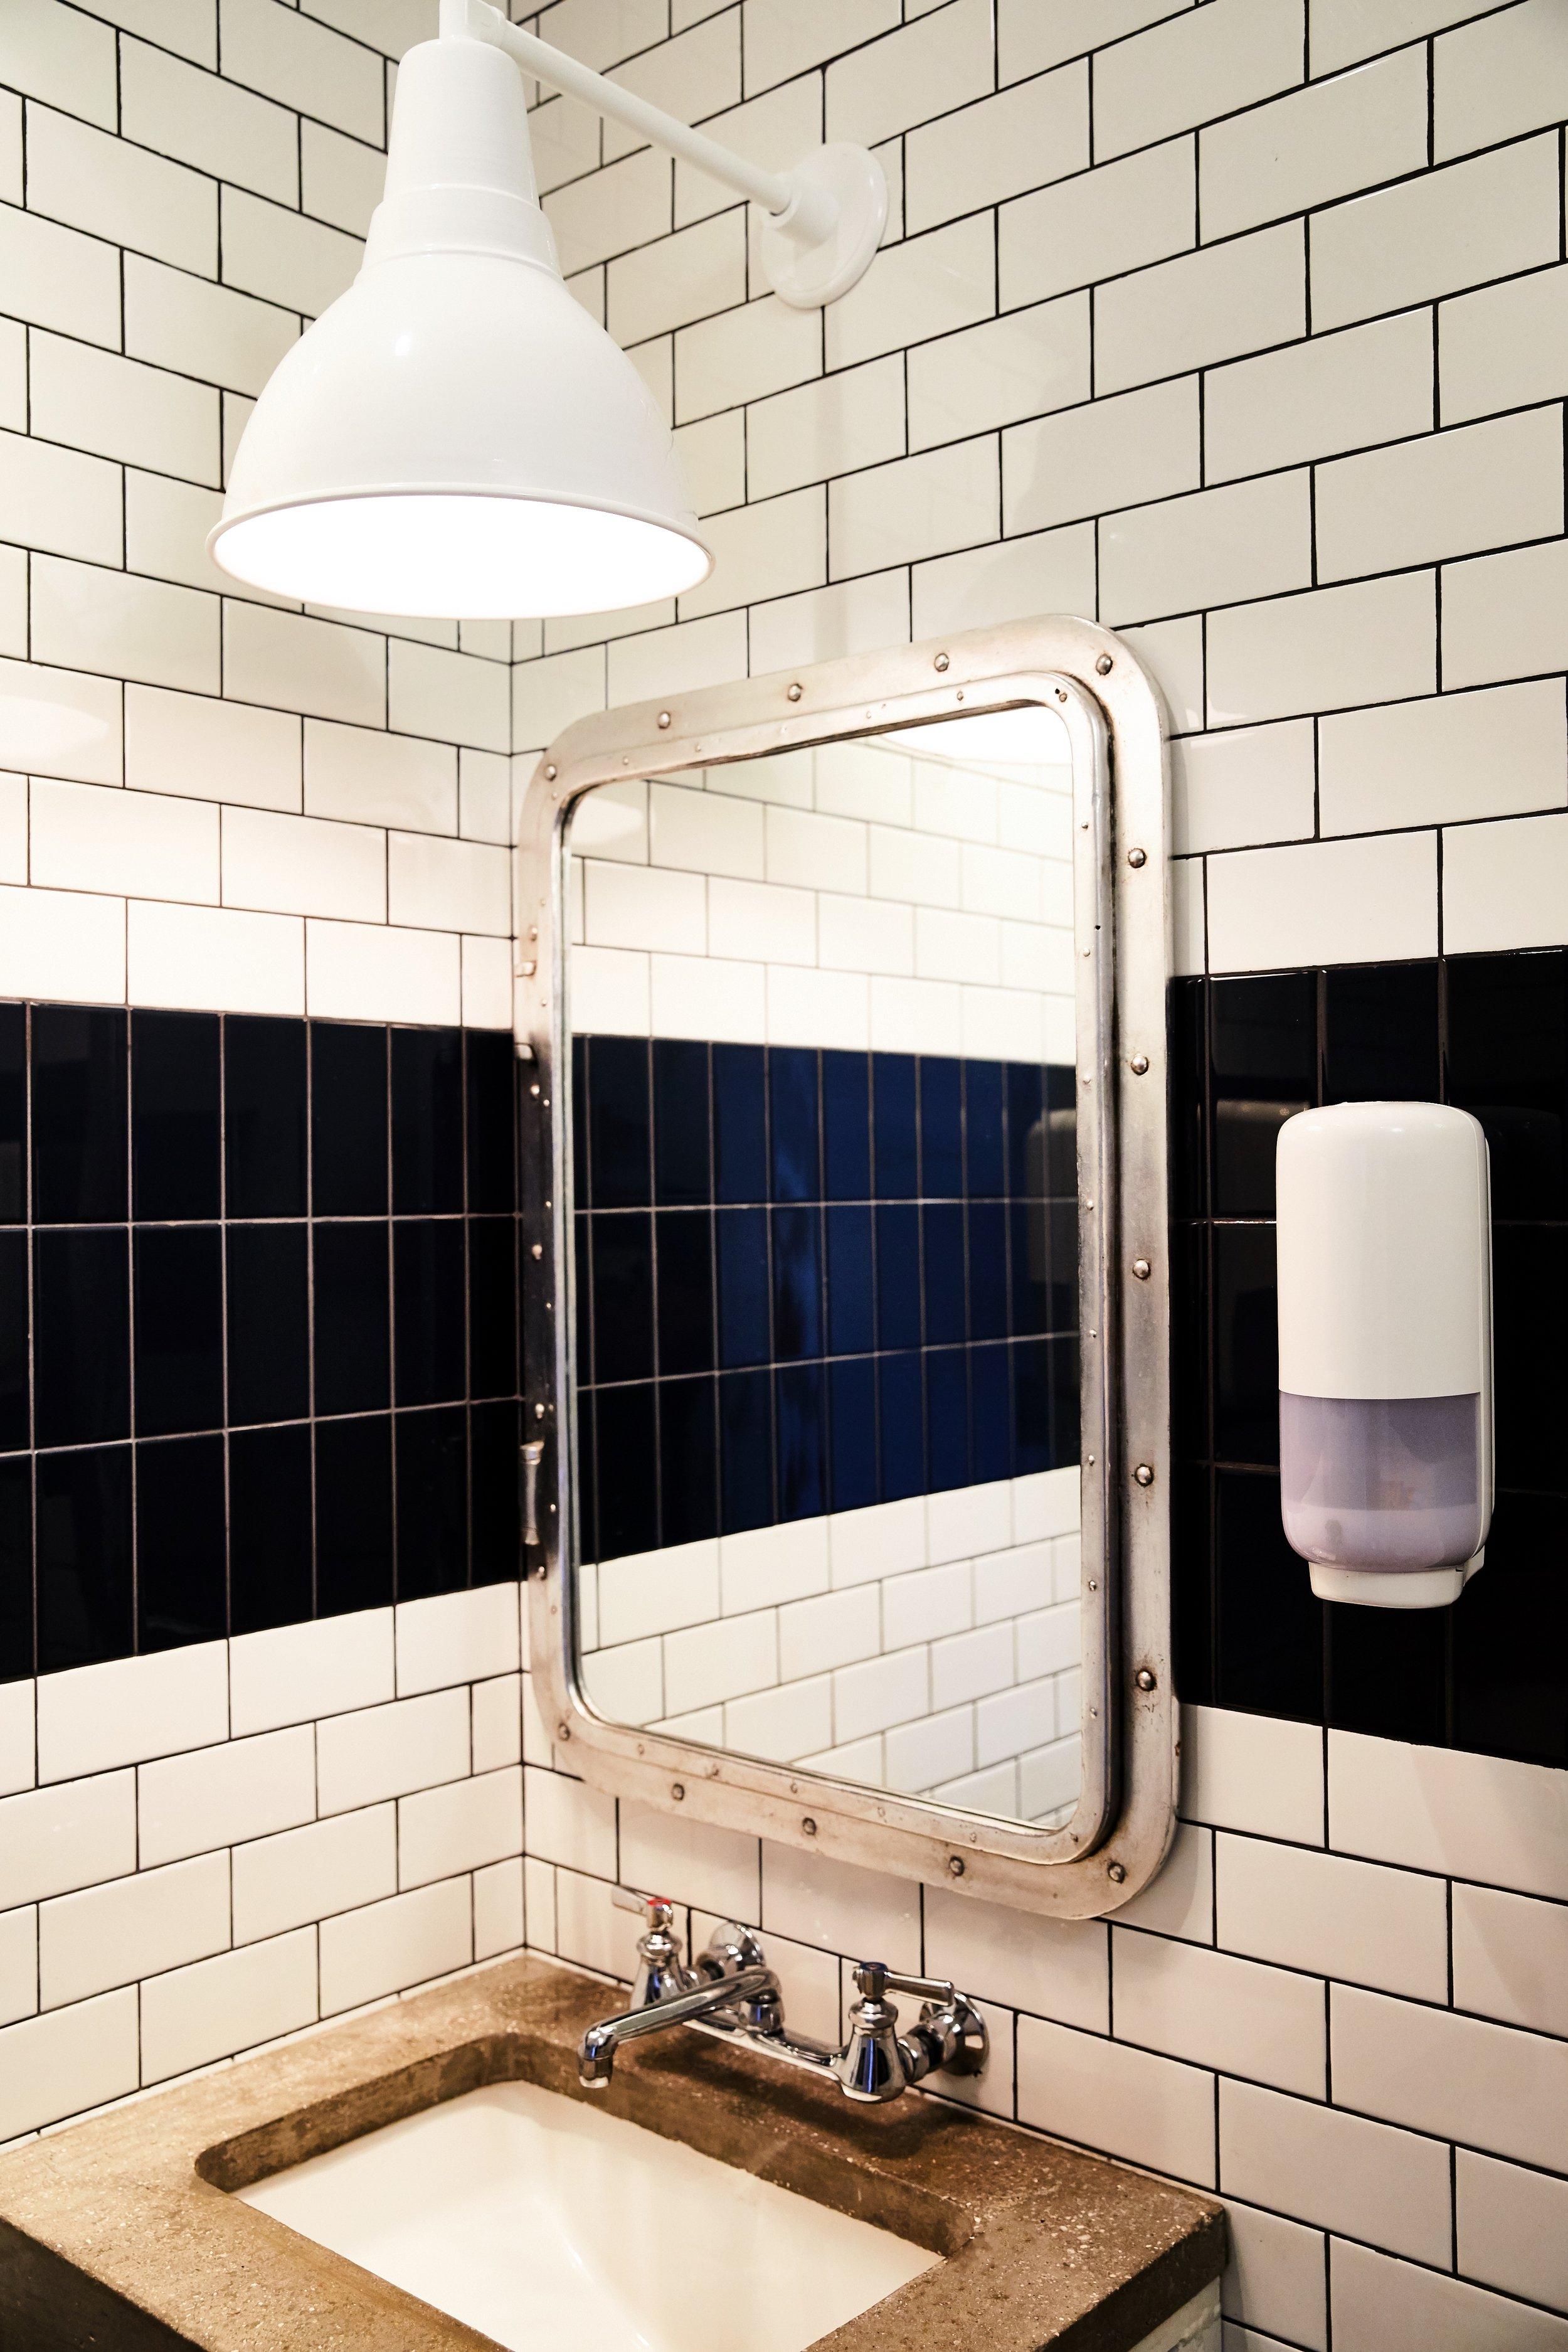 Southside Slice | Smith Hanes. Bathroom Details